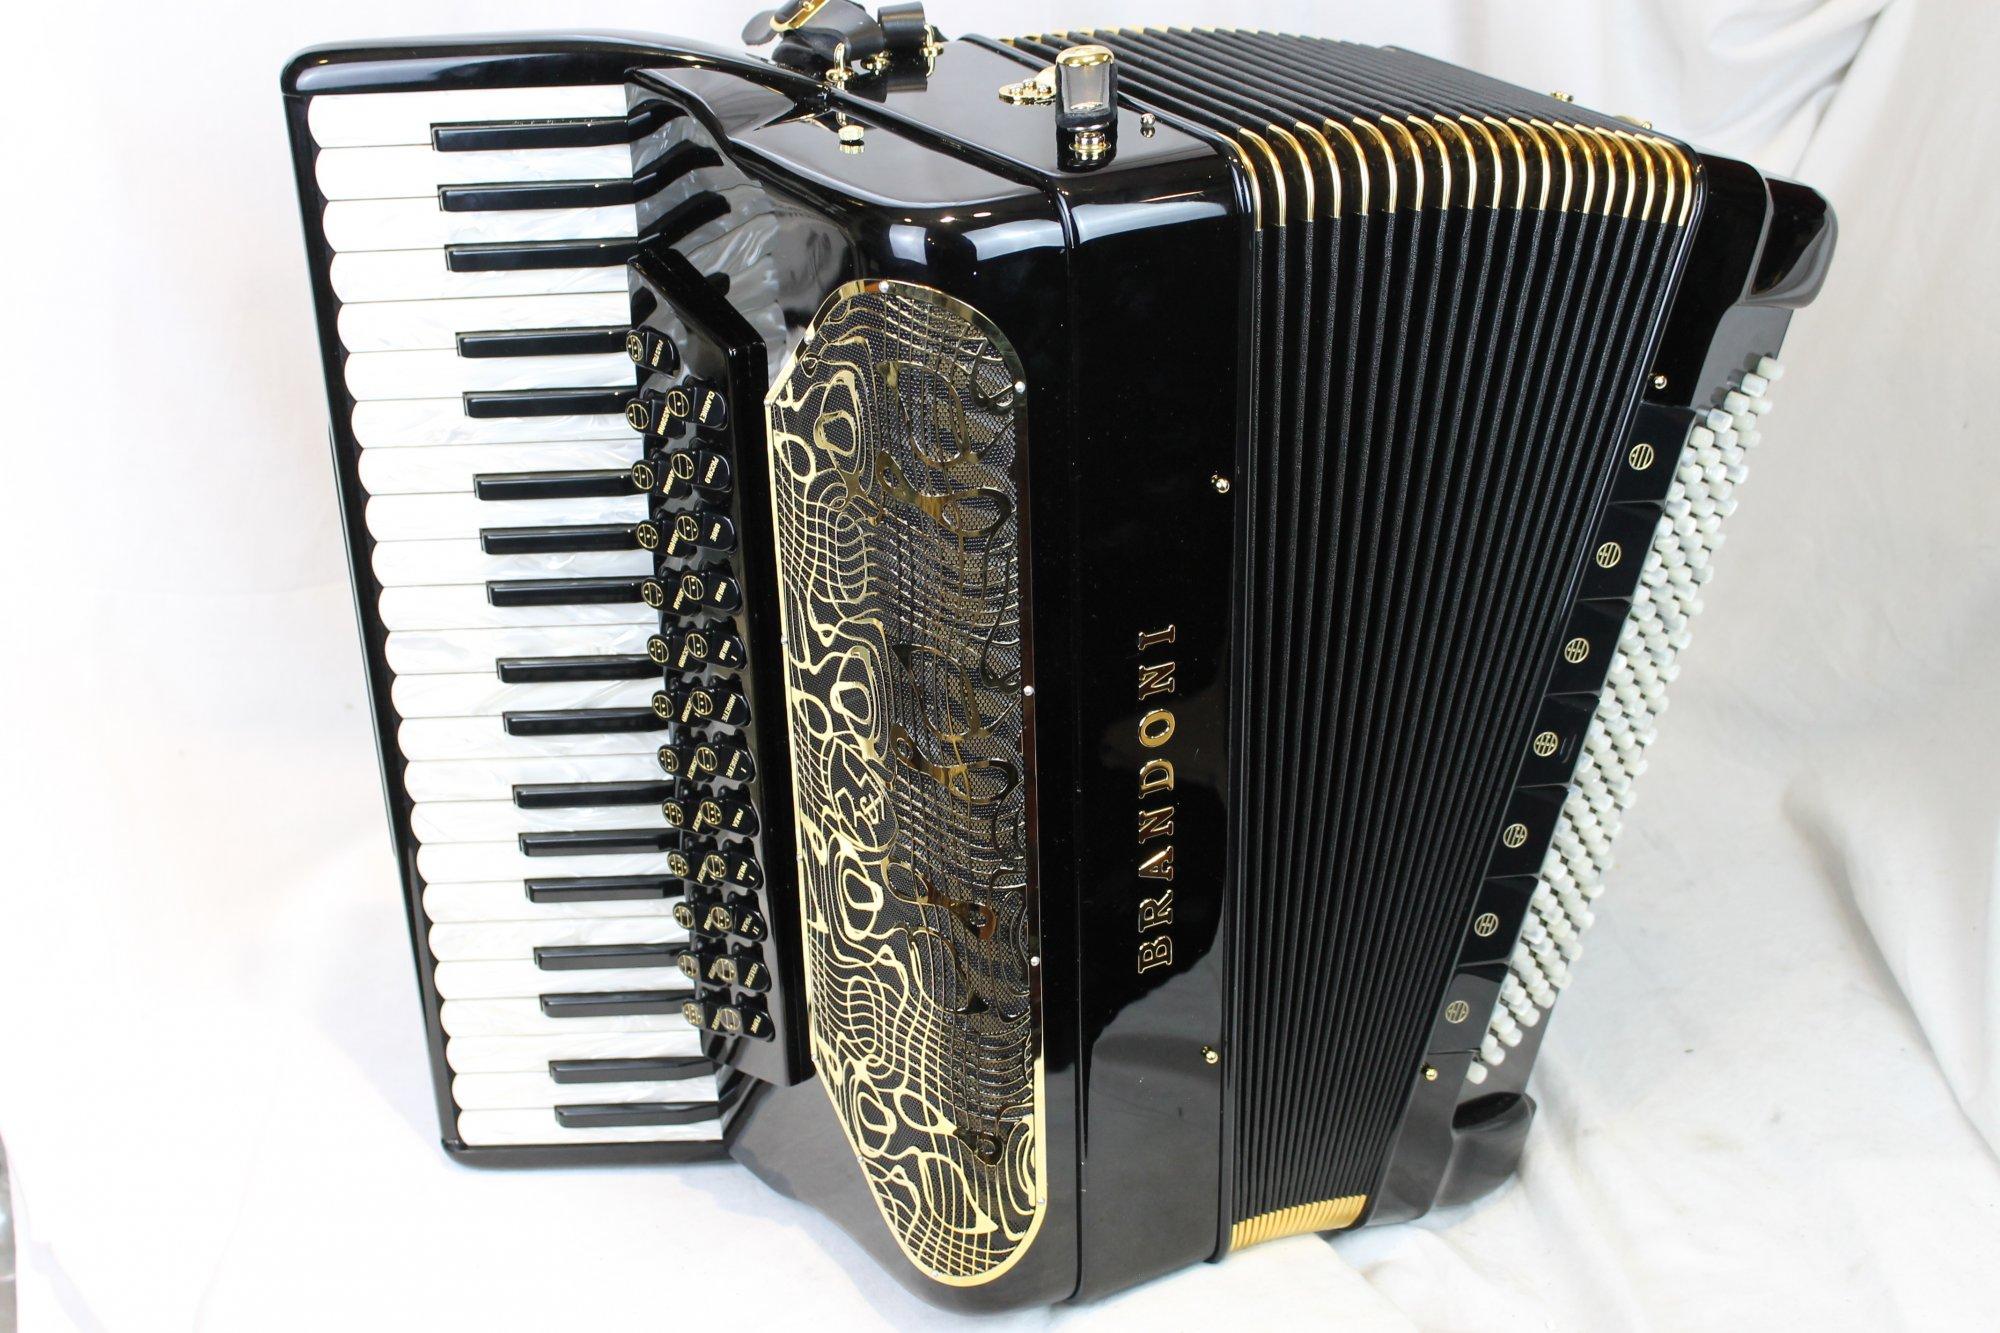 NEW Black Brandoni 149C Infinity Gold Piano Accordion LMMMH 41 120